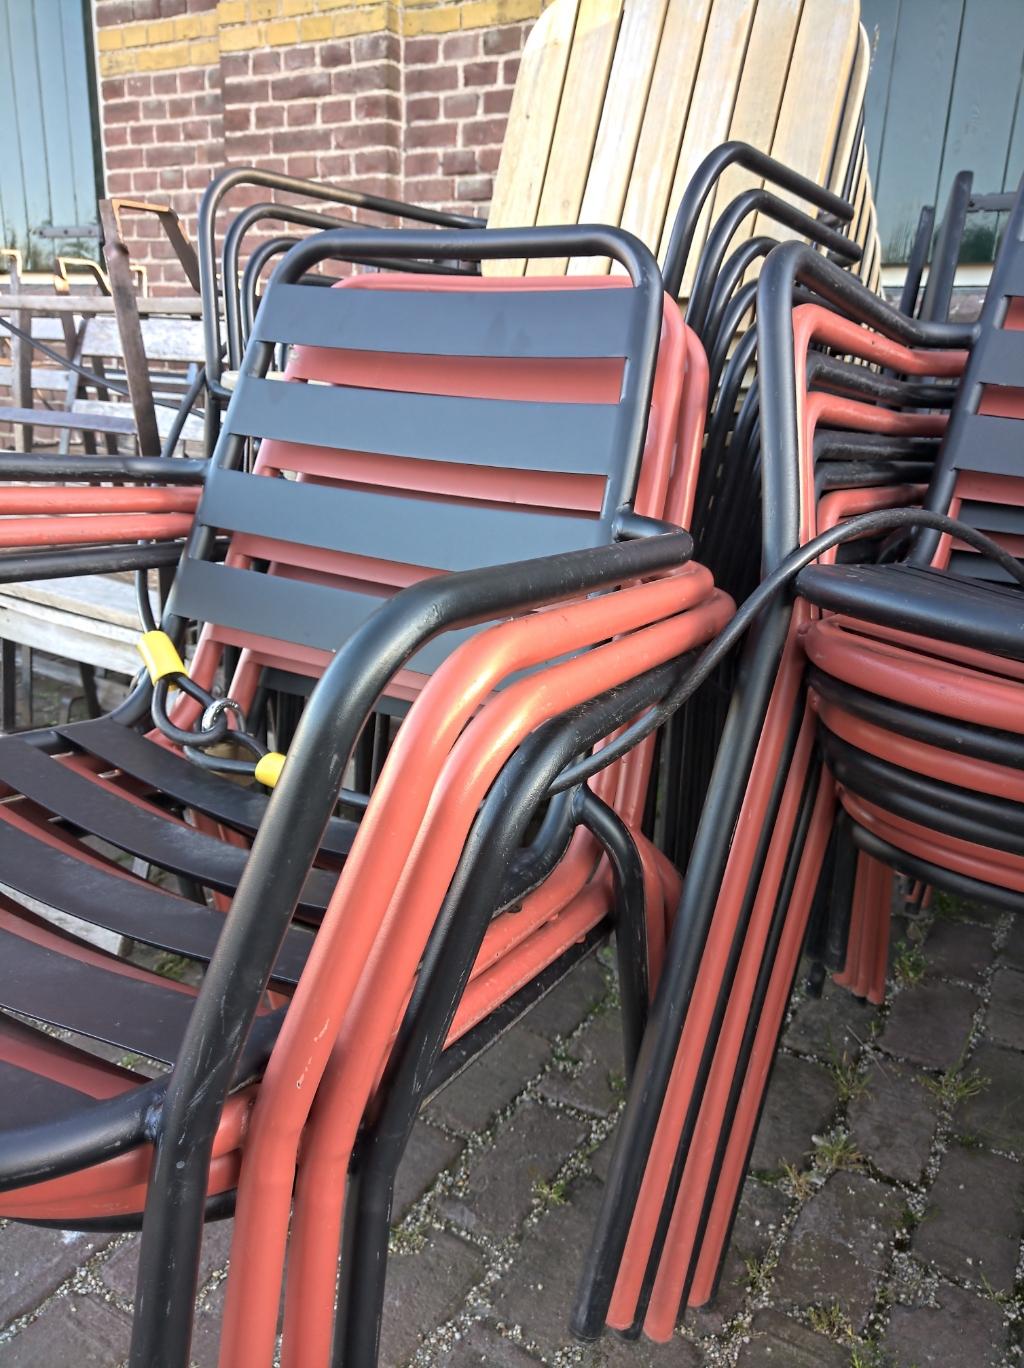 <p>Lege stoelen de komende weken in Enkhuizen.</p> <p>Foto: Rodi Media/IH</p> © rodi